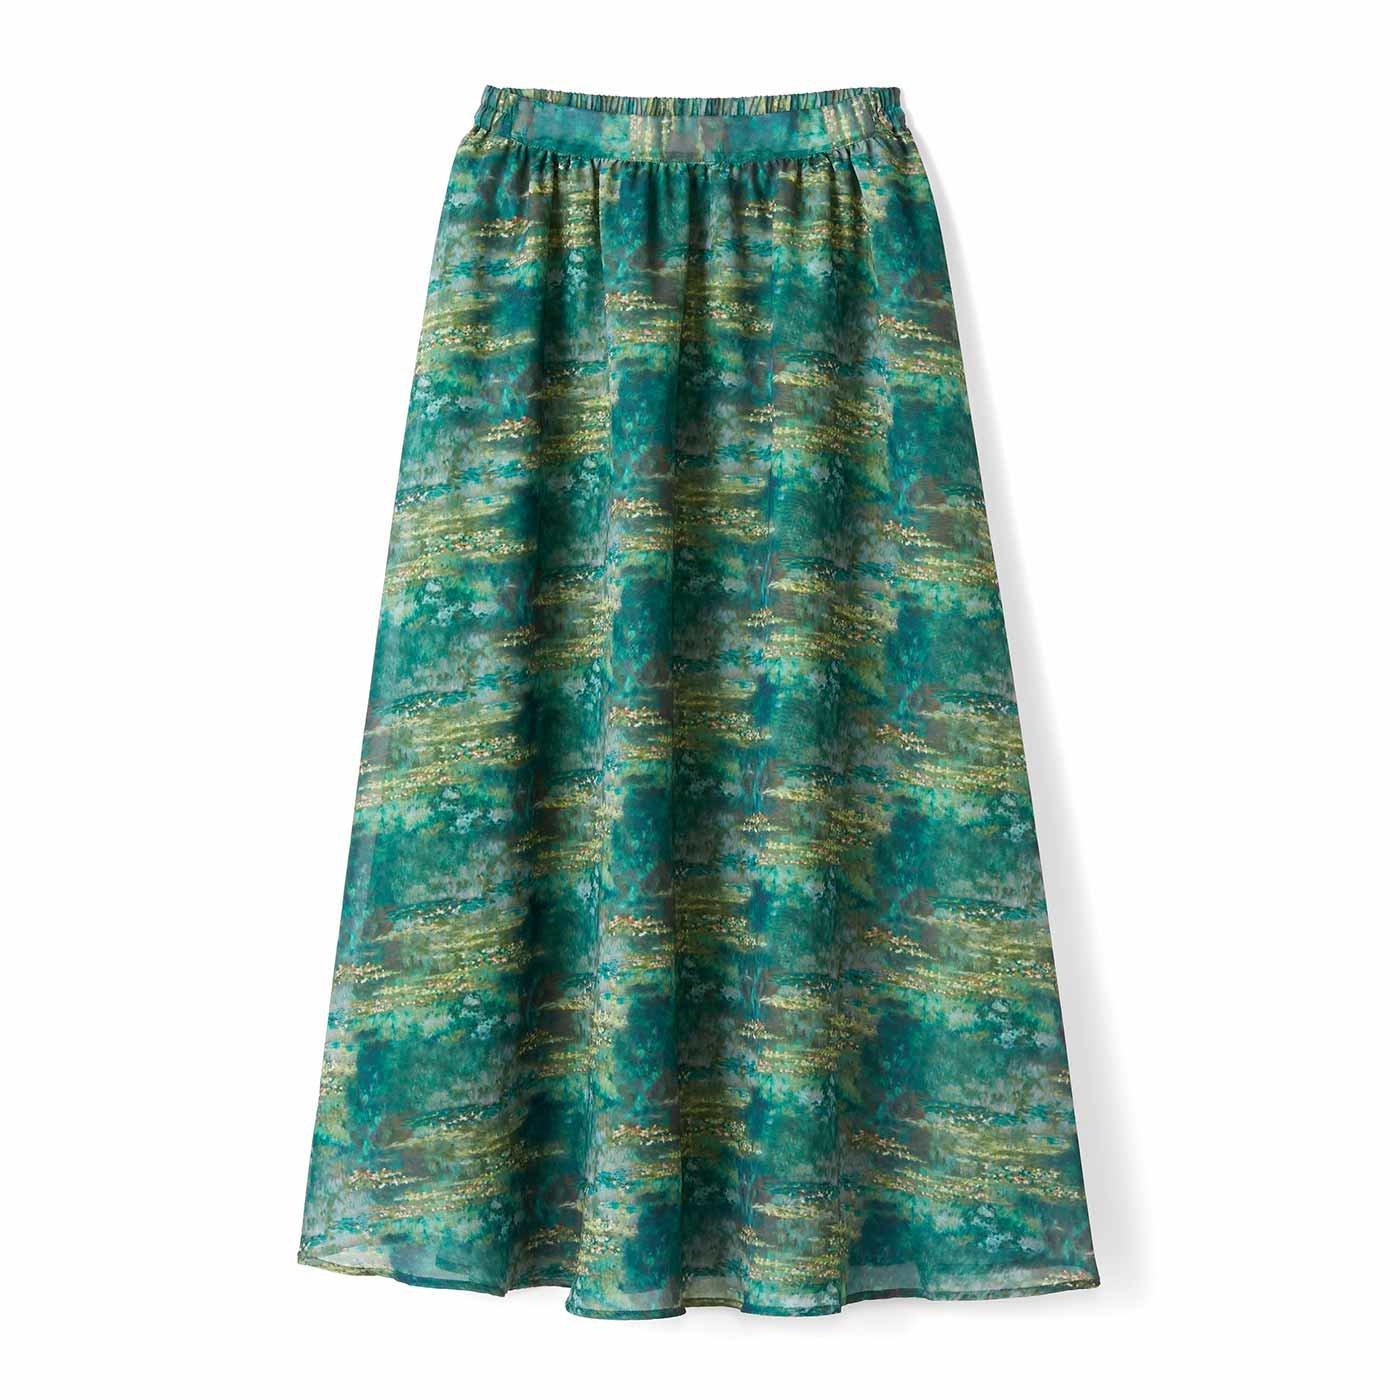 IEDIT[イディット] モネの睡蓮をまとうシフォンスカート〈グリーン〉